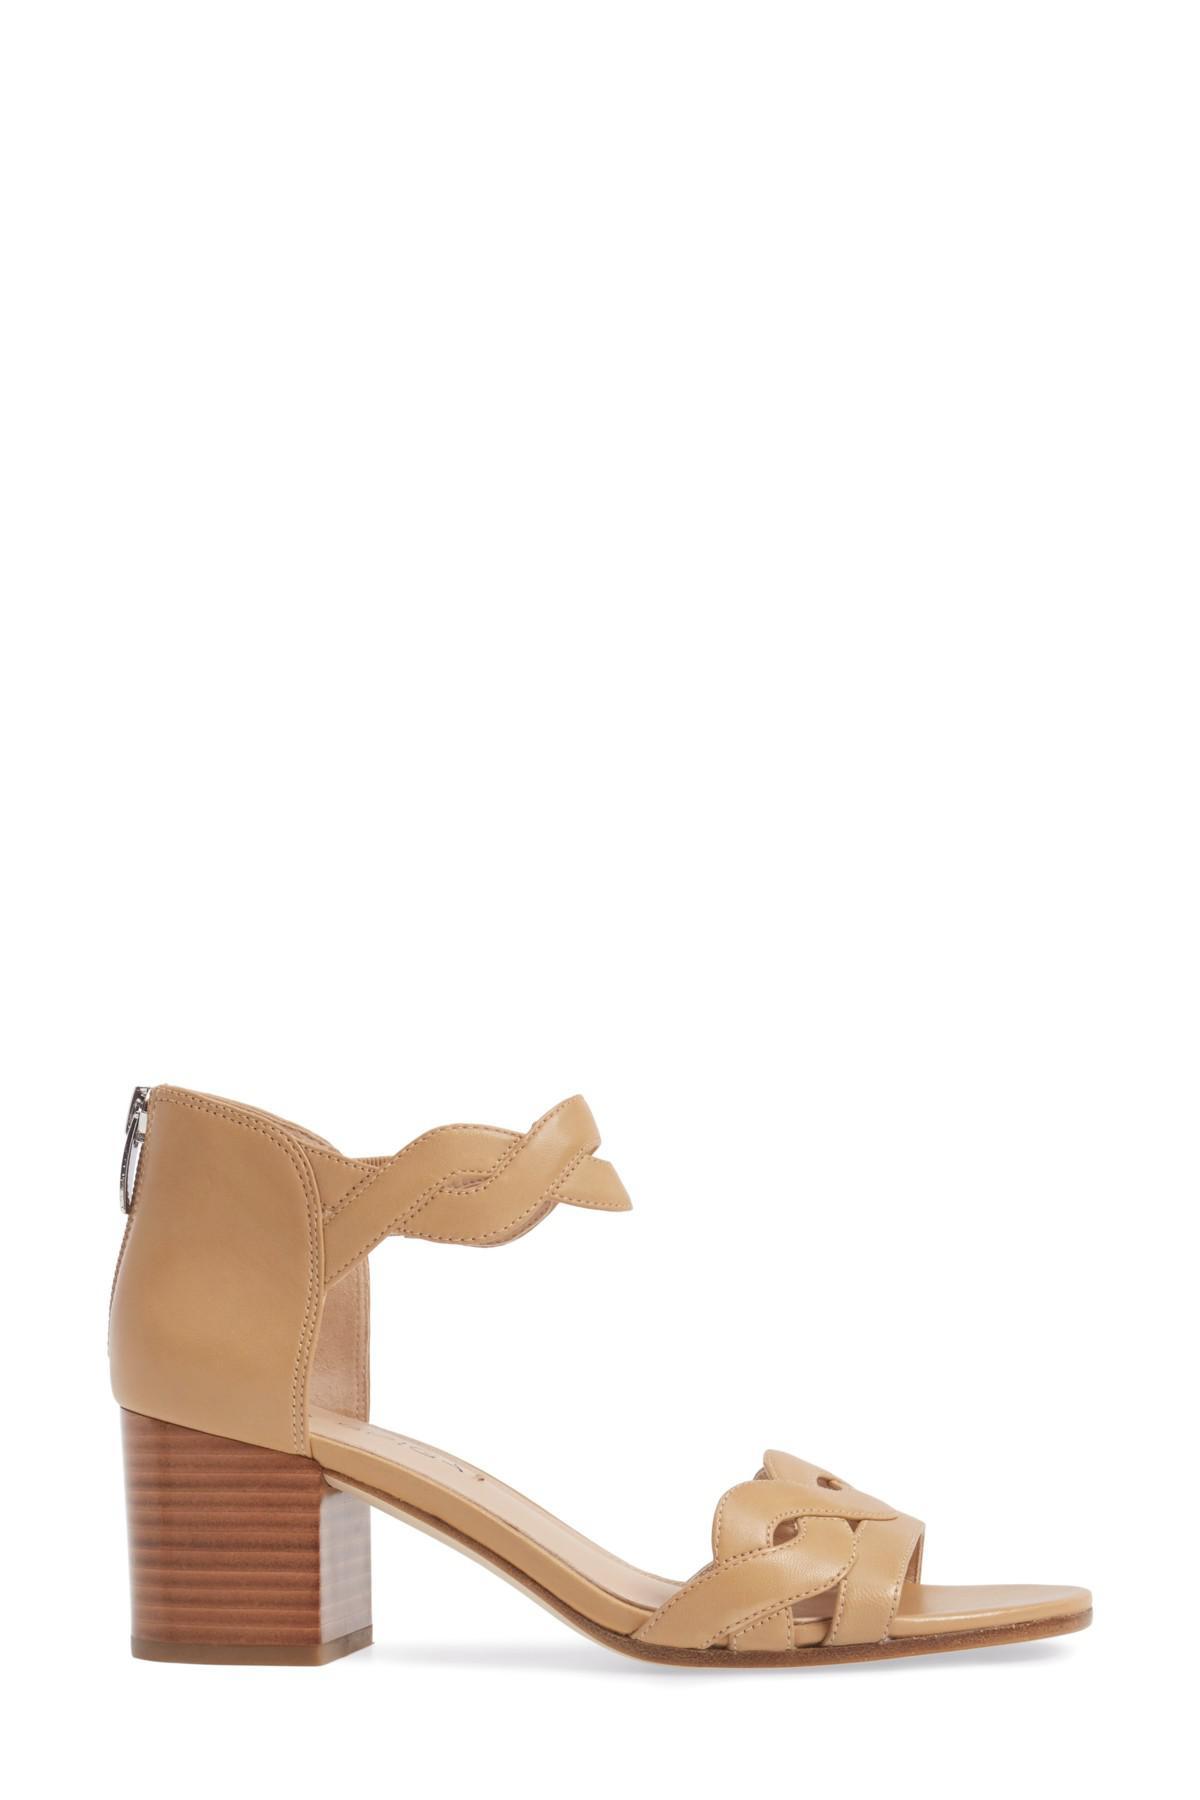 cac0482b550f Lyst - Via Spiga Janel Block Heel Sandal (women) in Natural